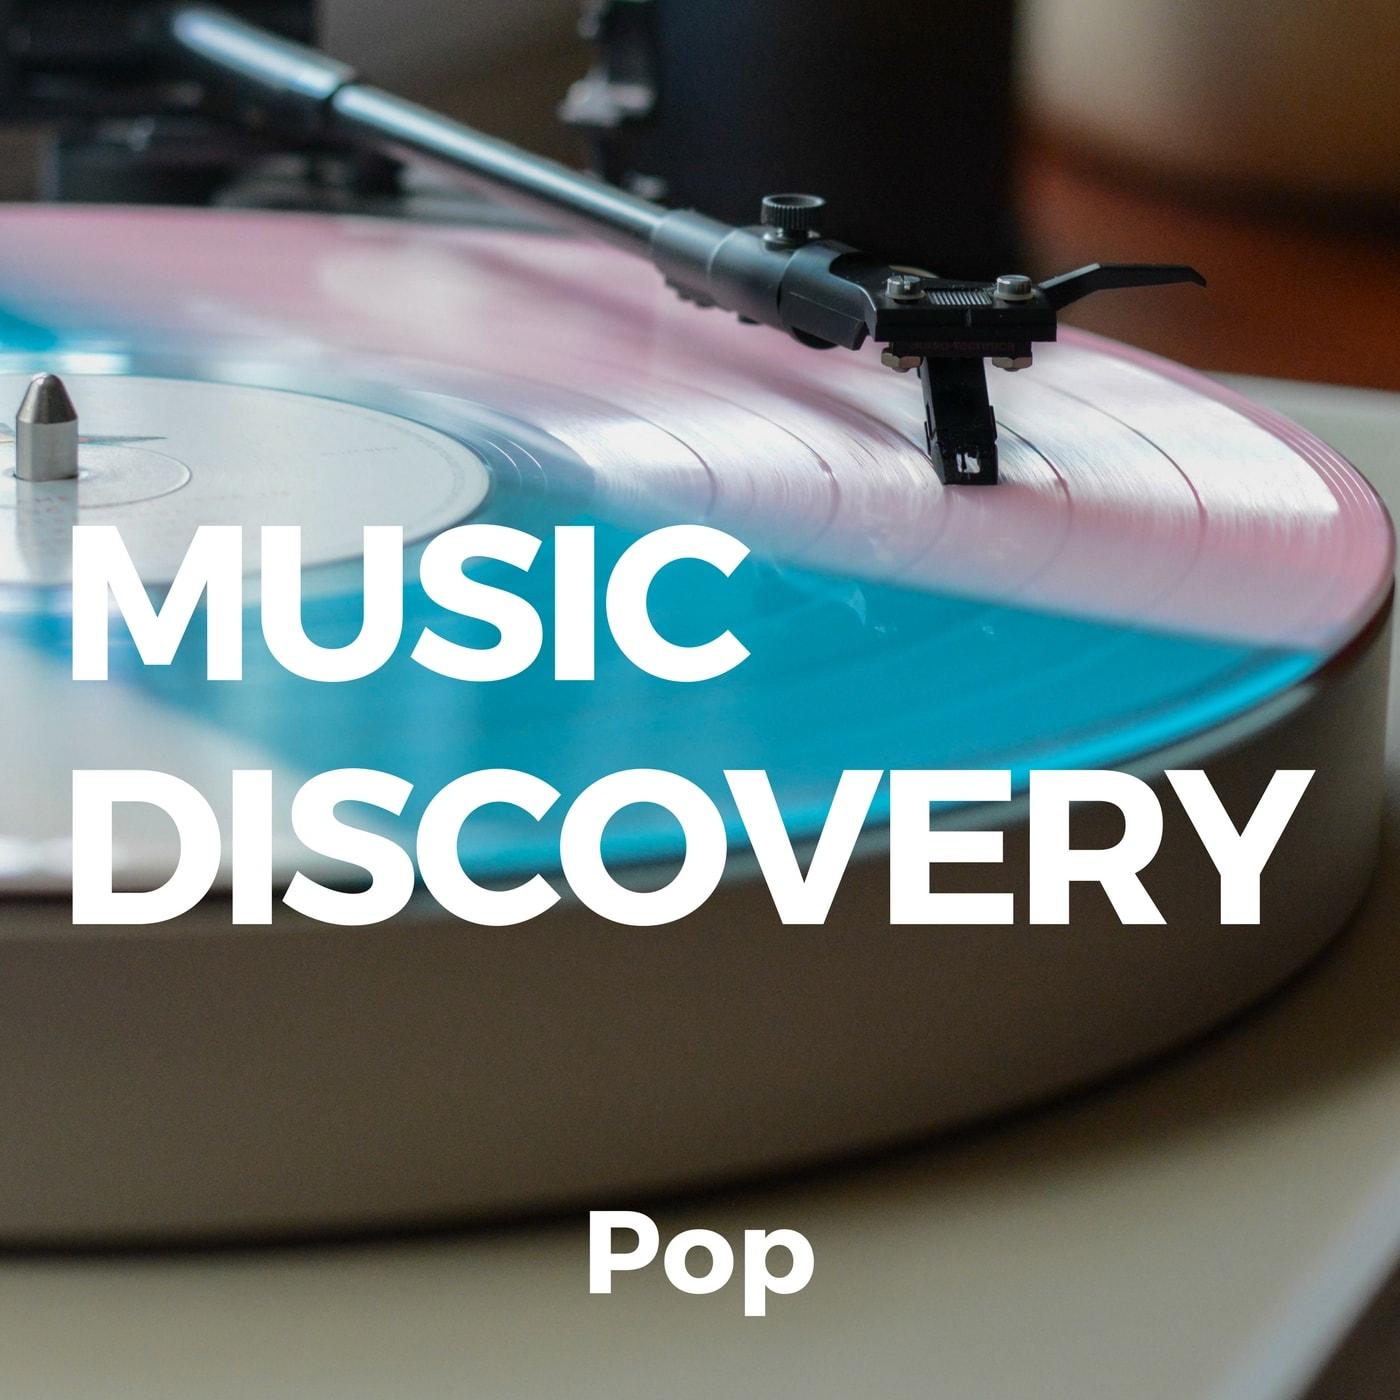 Music Discovery - Pop playlist